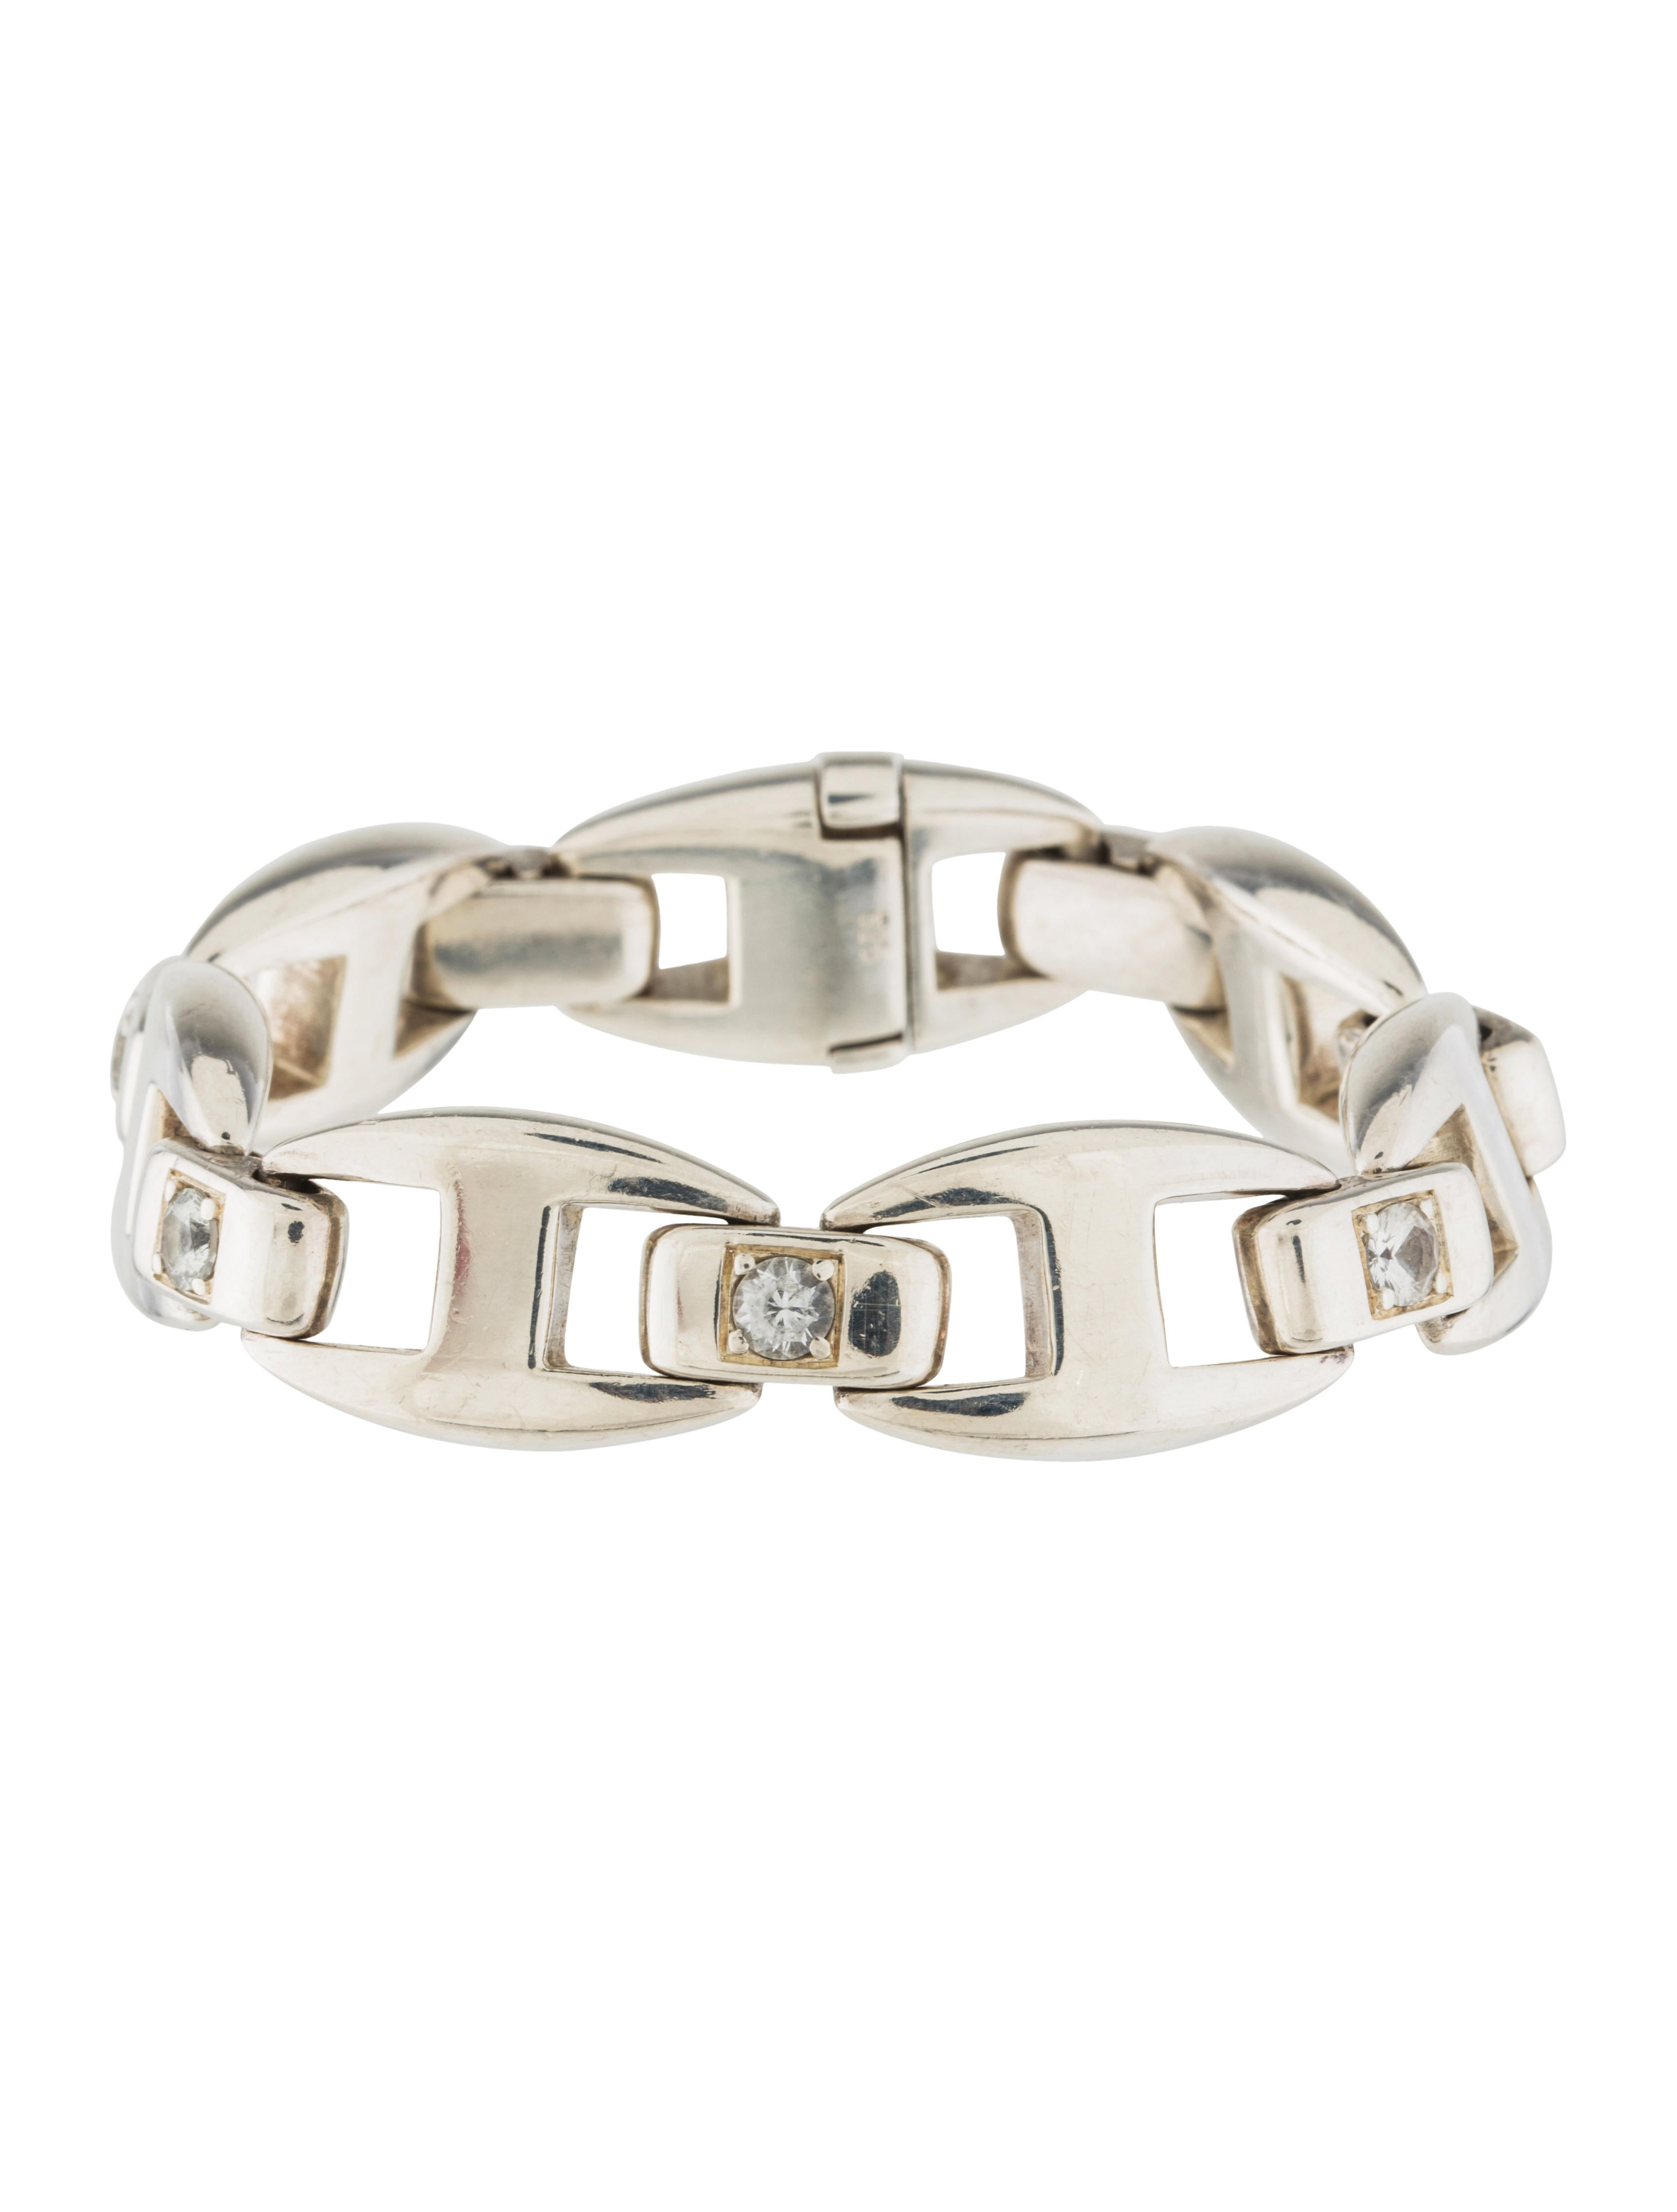 herm 232 s white sapphire cassiopee bracelet bracelets